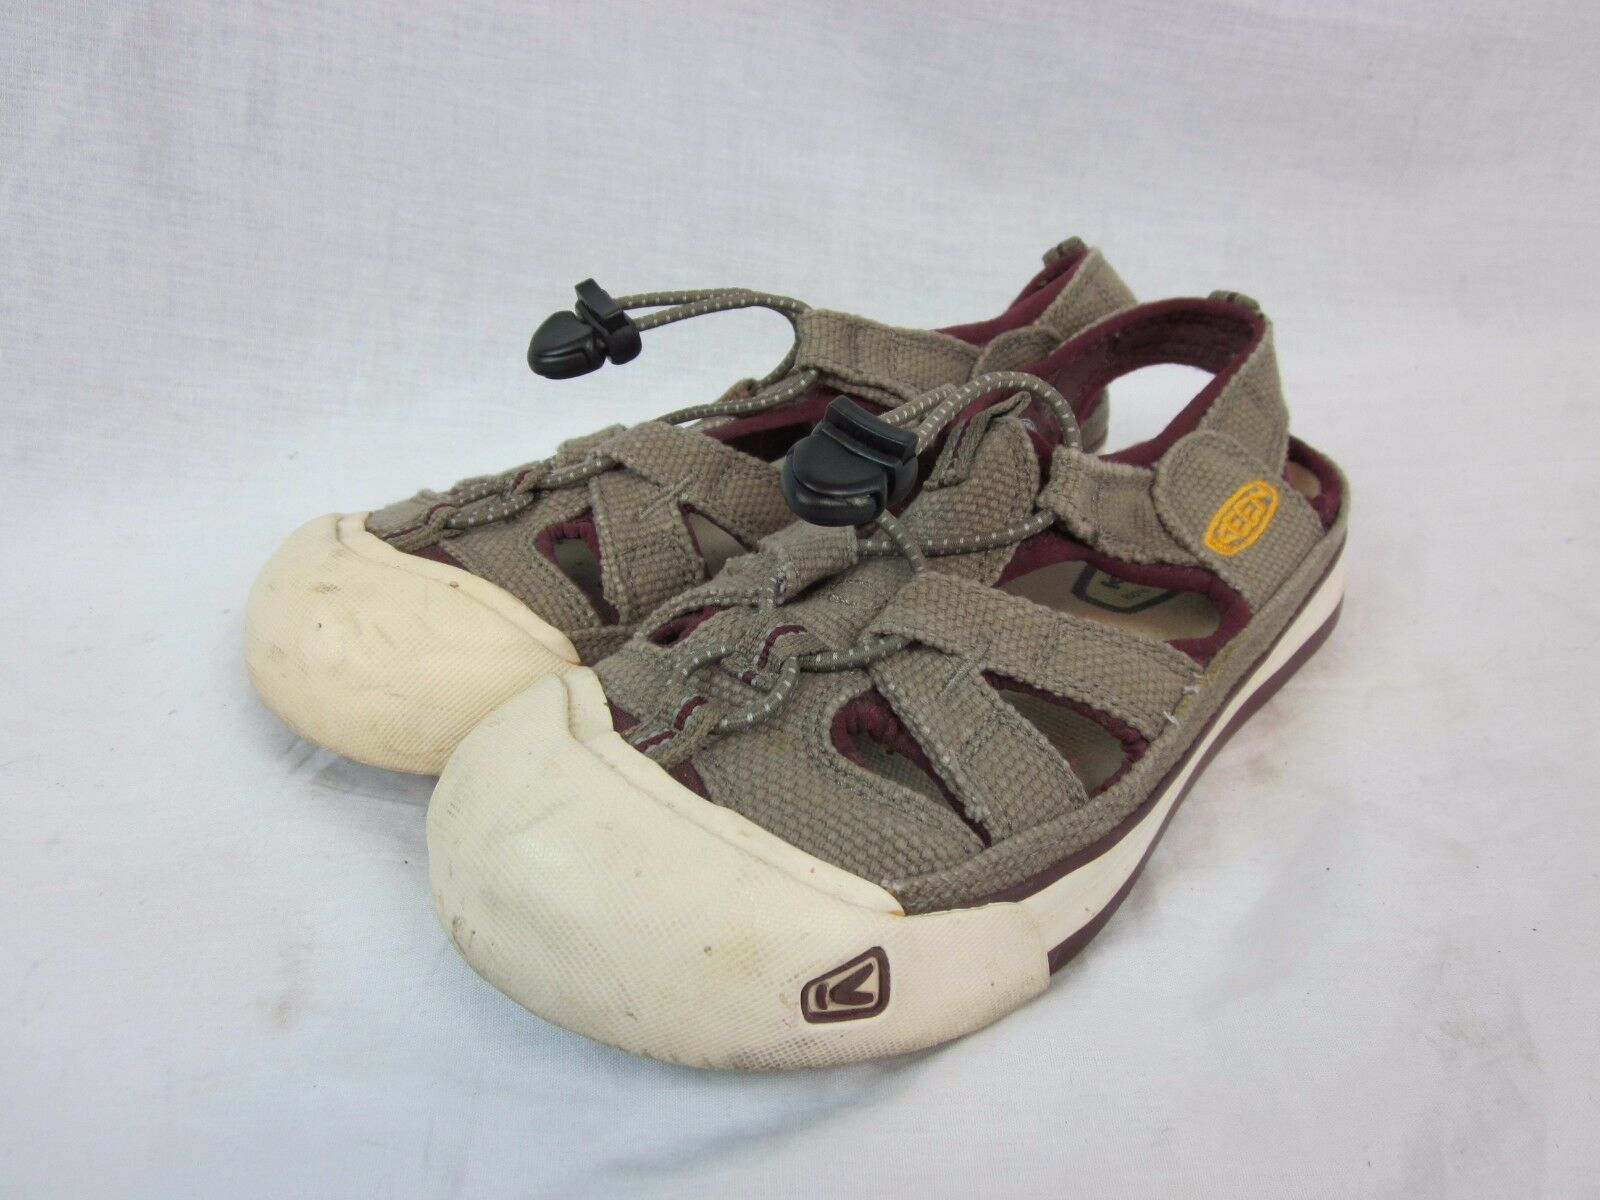 KEEN 5393 Cgoldnado Bungee Taupe Canvas Slip On Sport Sandals Women's U.S. 7